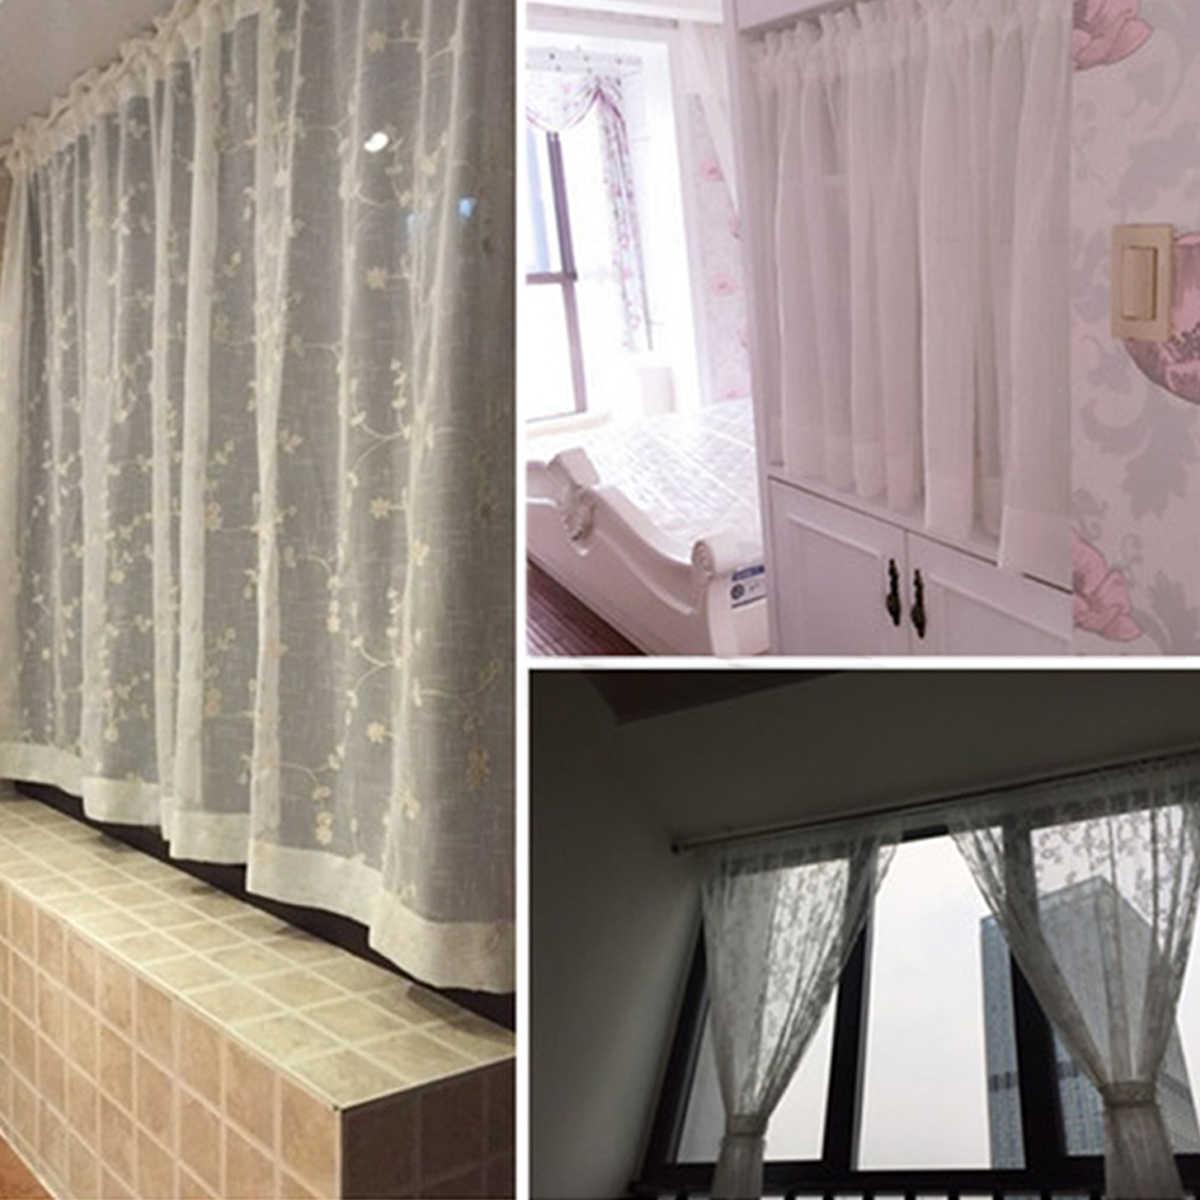 5 PCS Bathroom Shower Curtain Rod Adjustable Tension Extendable Bath Pole